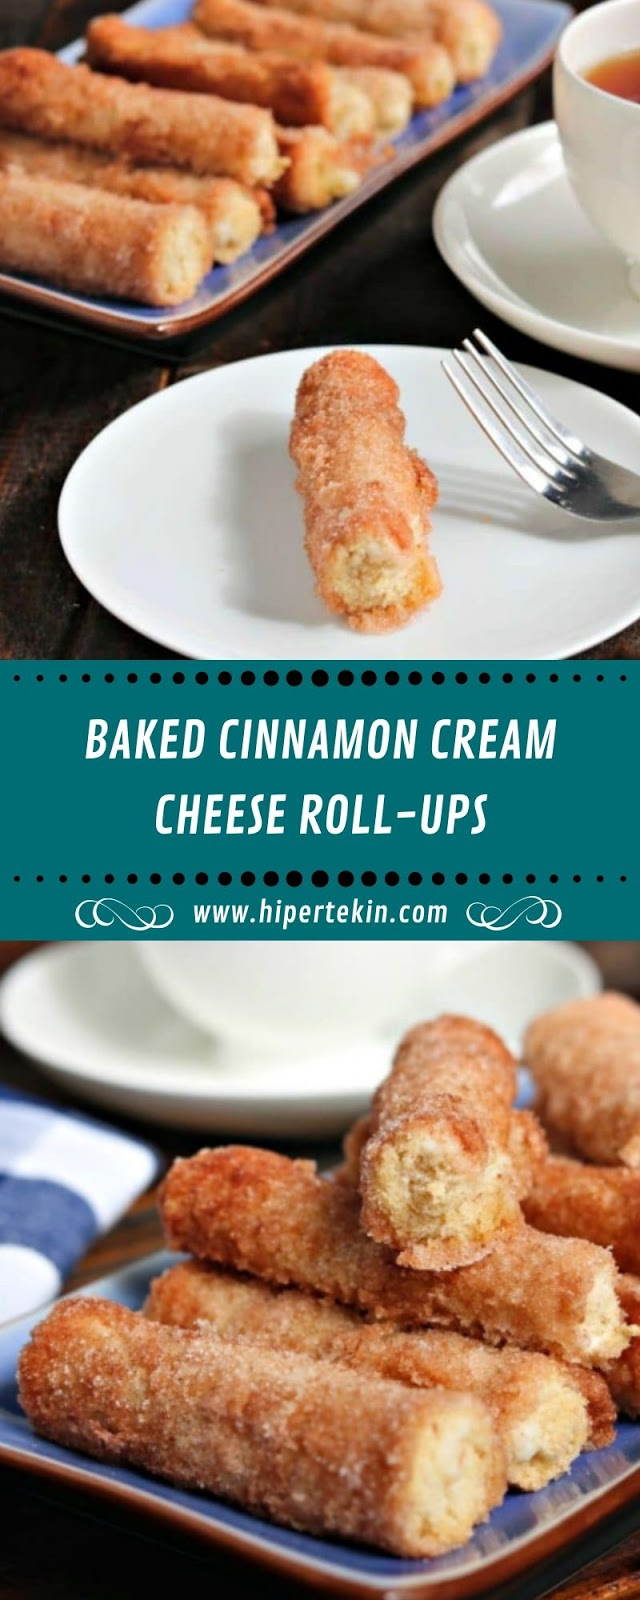 BAKED CINNAMON CREAM CHEESE ROLL-UPS